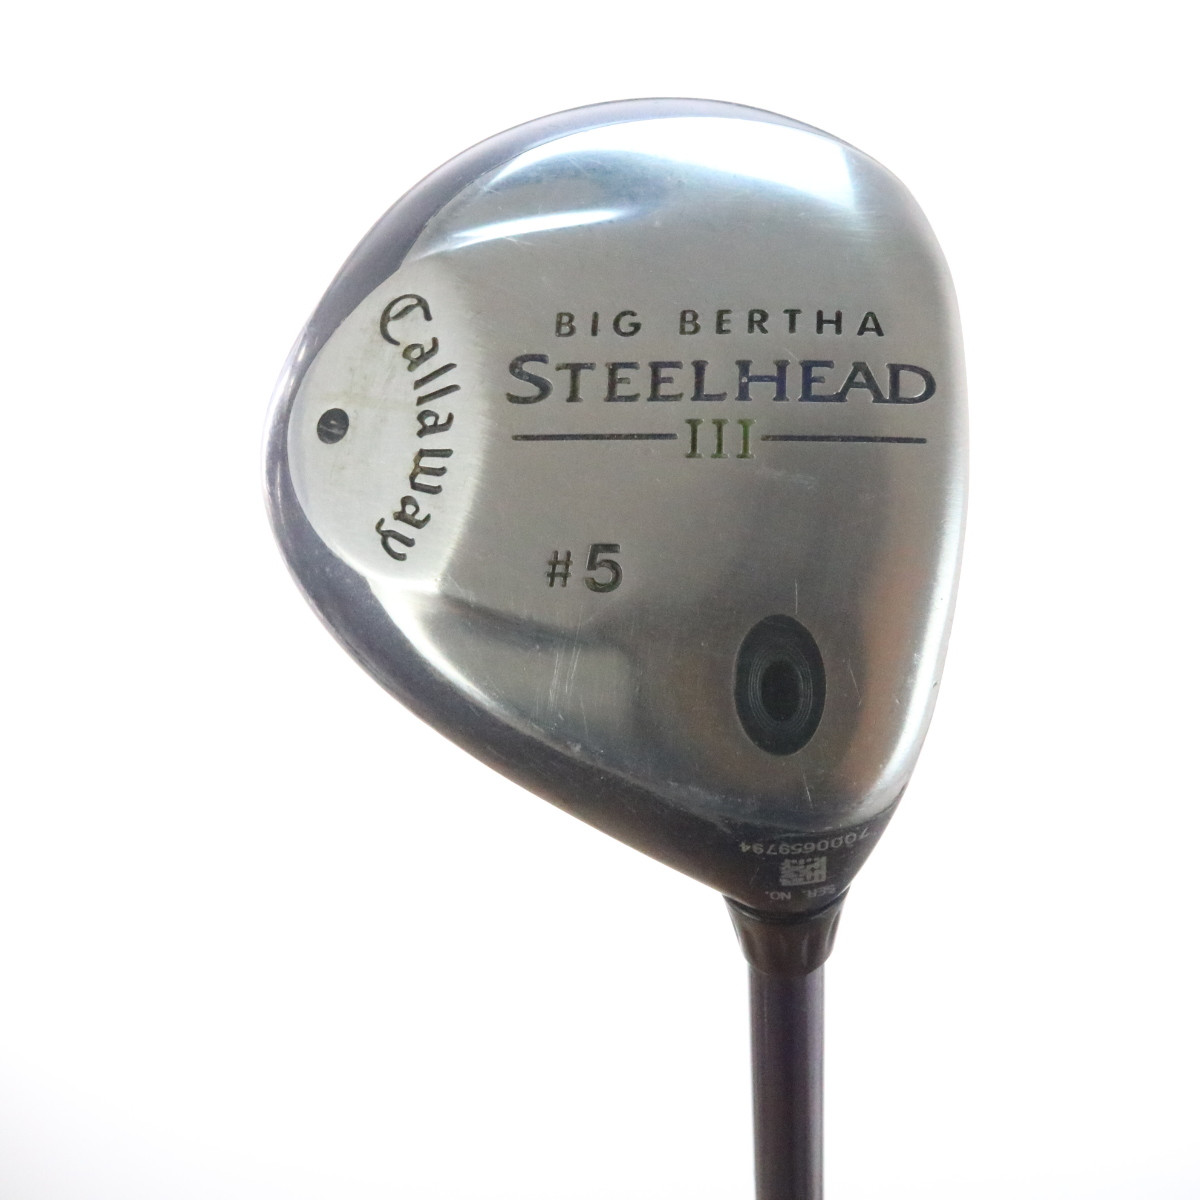 BIG BERTHA STEELHEAD III DRIVER FOR WINDOWS 10